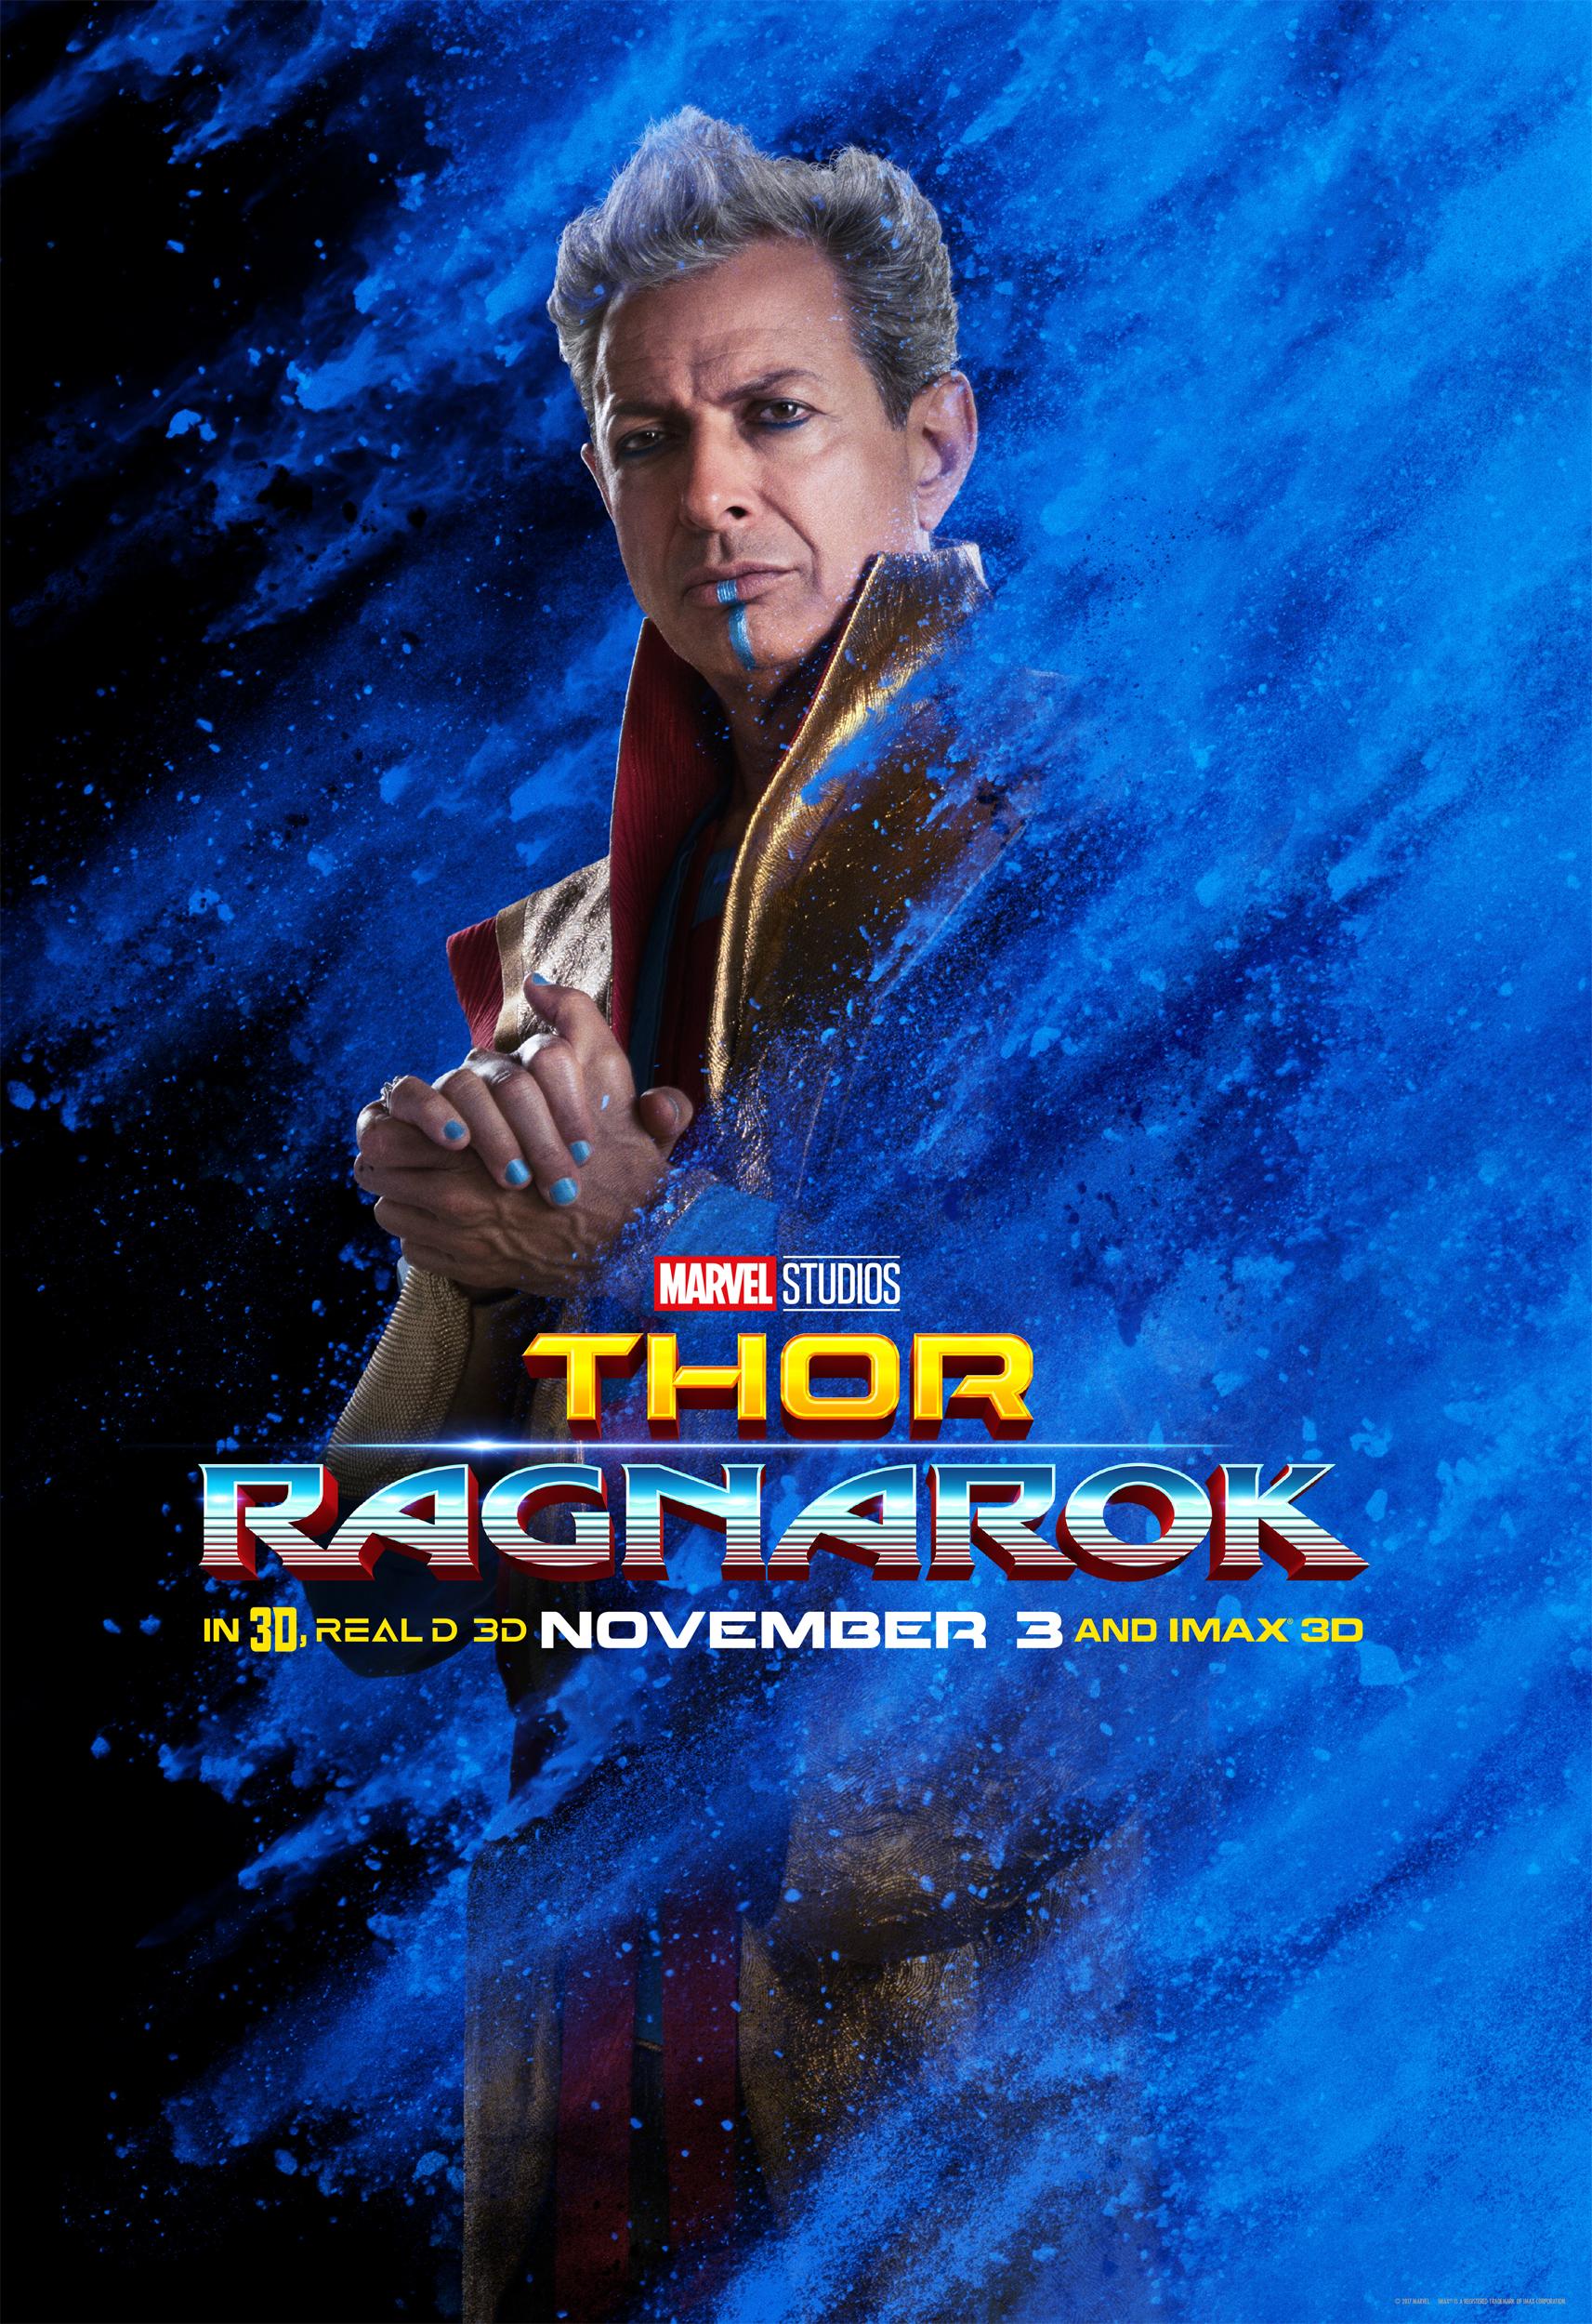 Image grandmaster character poster thor ragnarokg marvel grandmaster character poster thor ragnarokg voltagebd Gallery